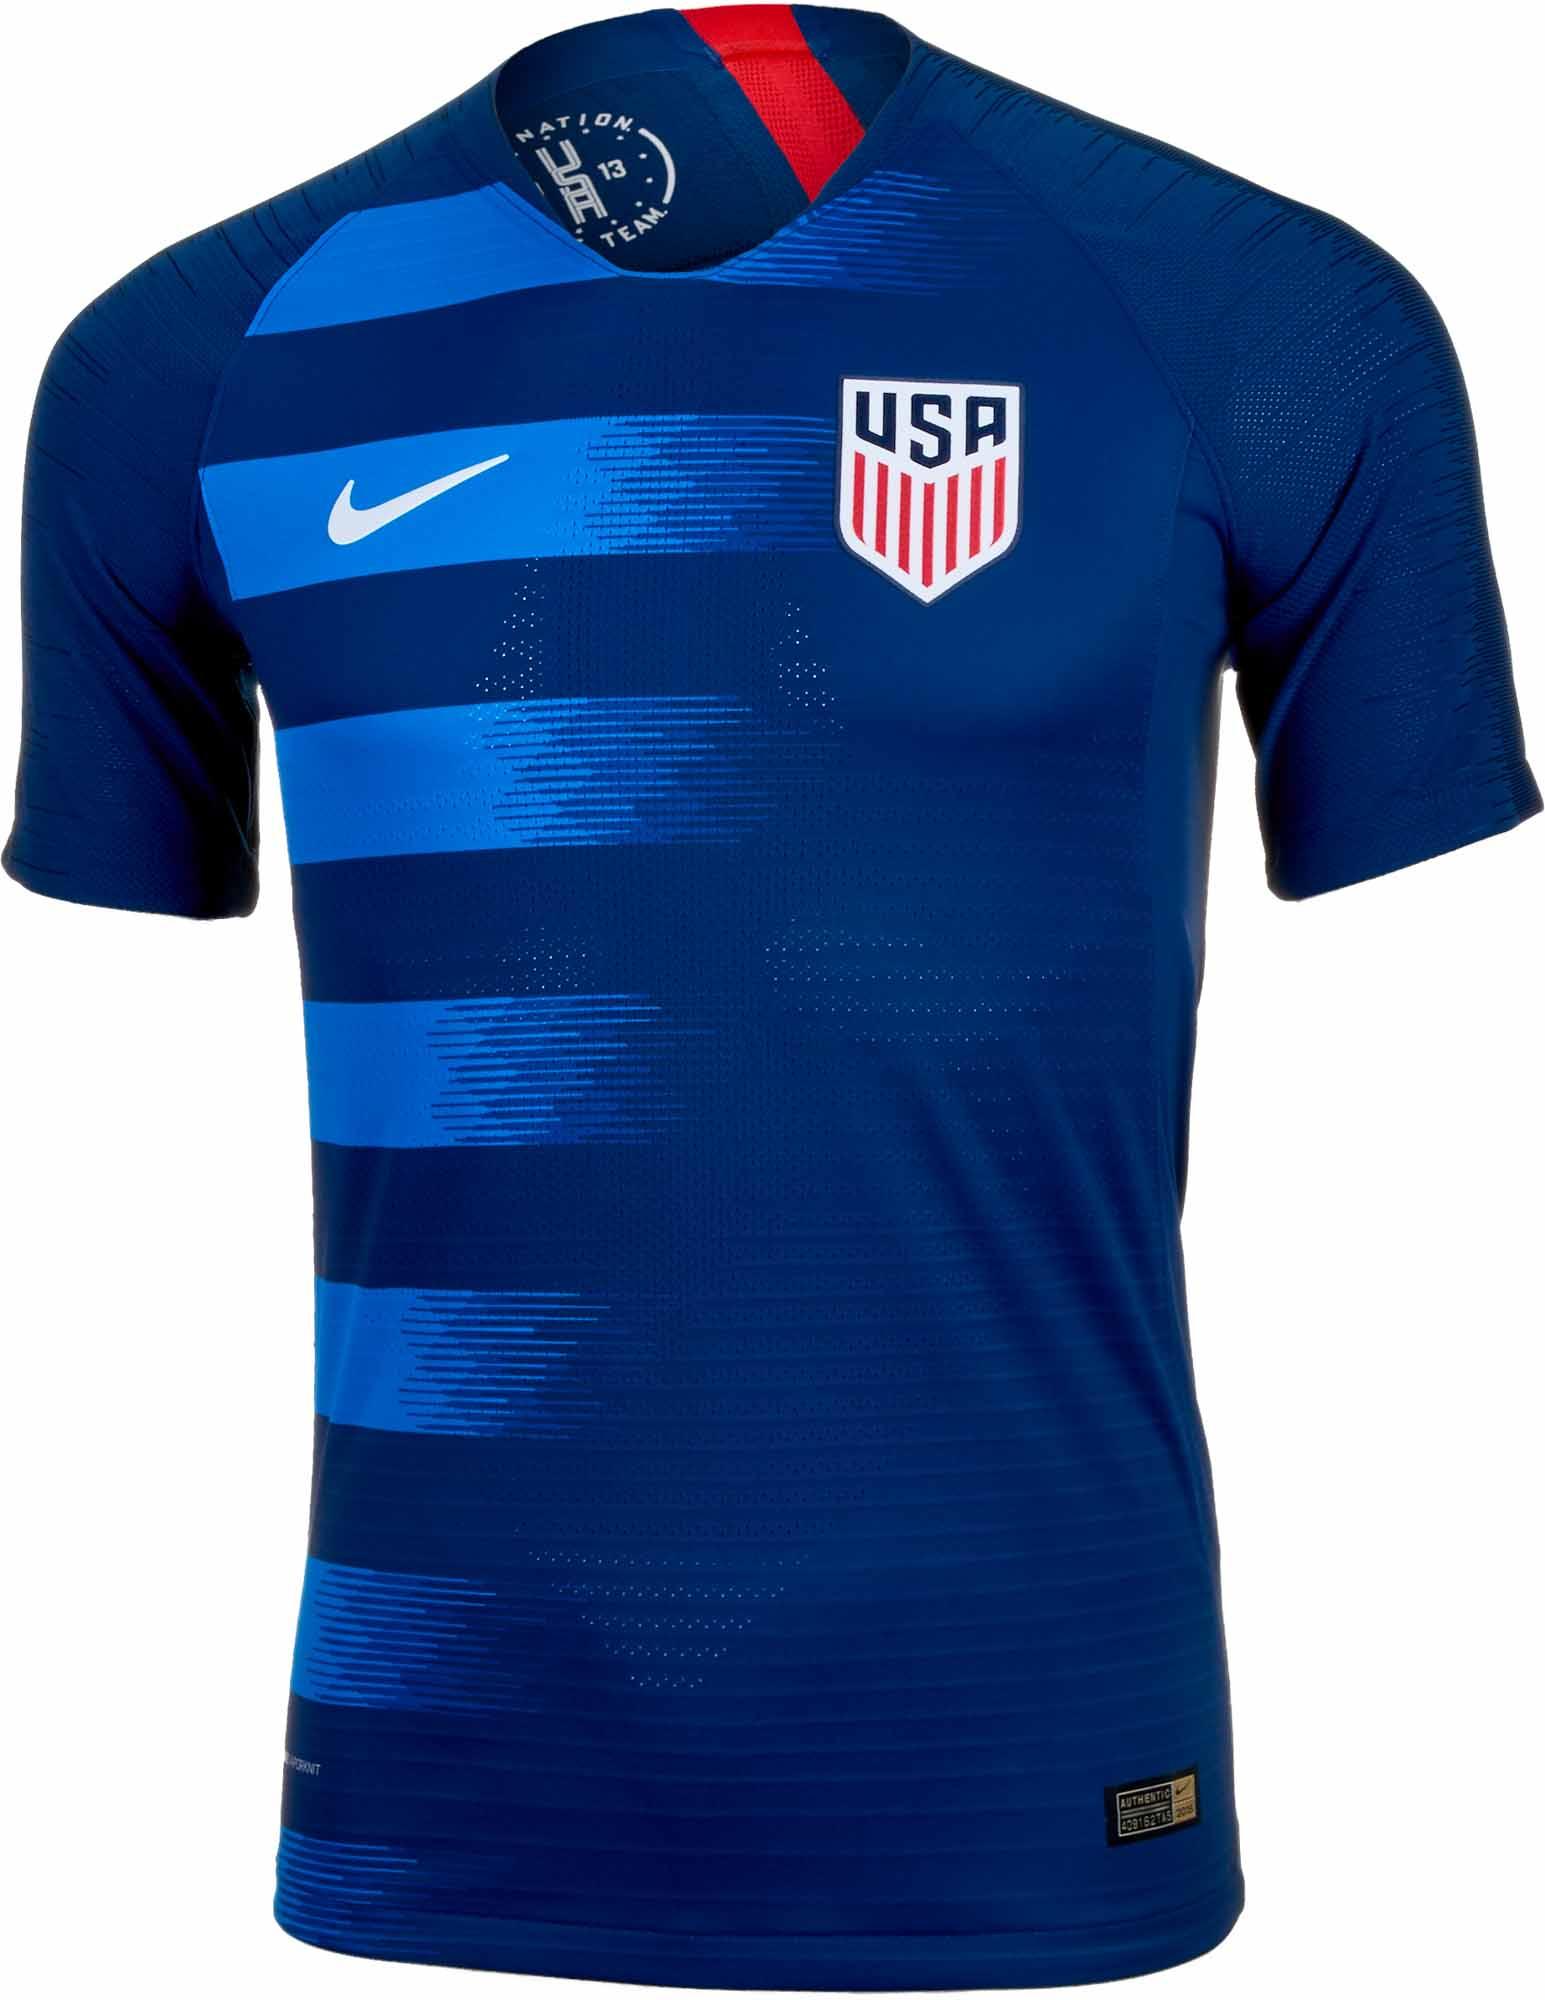 Nike USA Away Match Jersey 2018-19 - SoccerPro.com